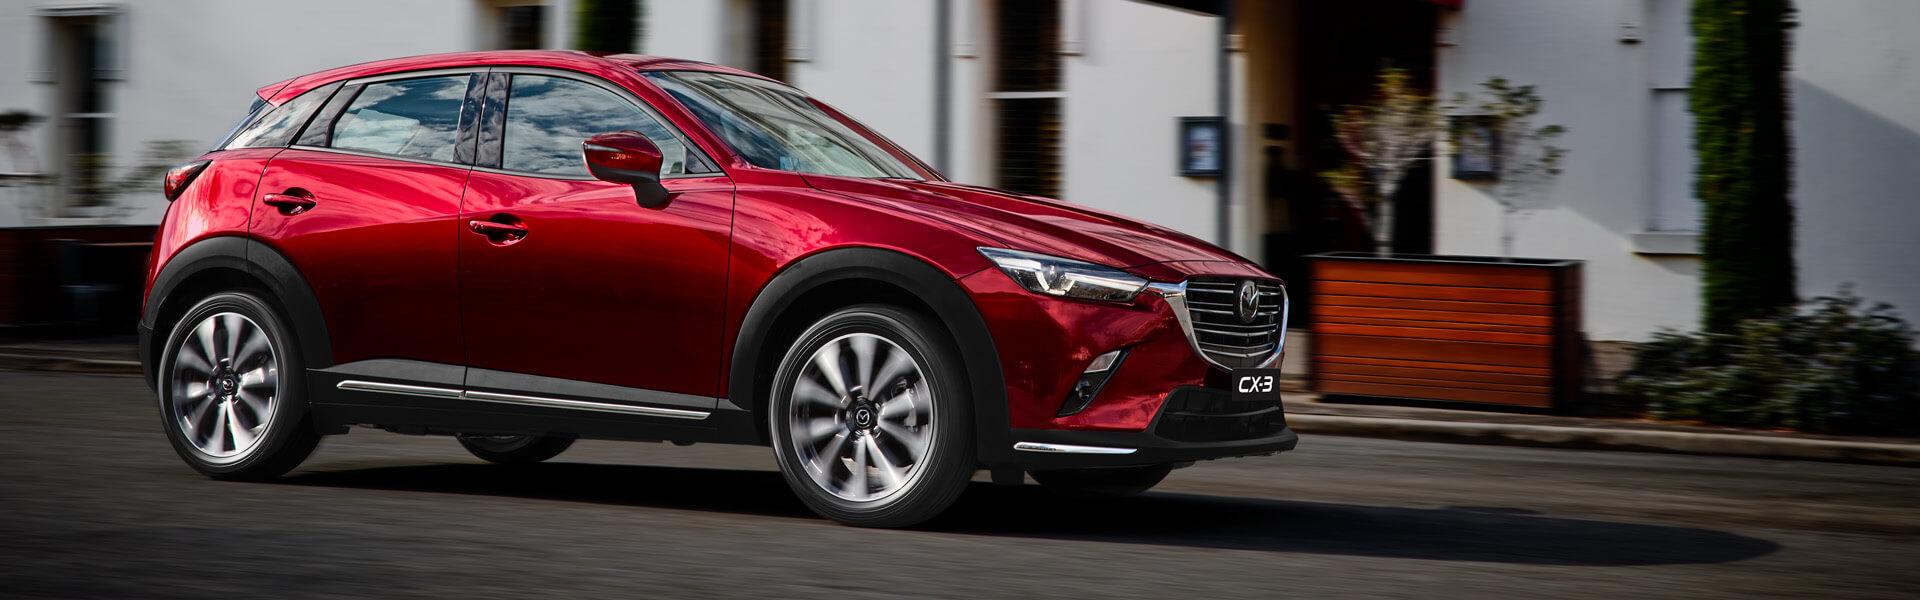 New Mazda Cx 3 For Sale In Gold Coast Southport Mazda